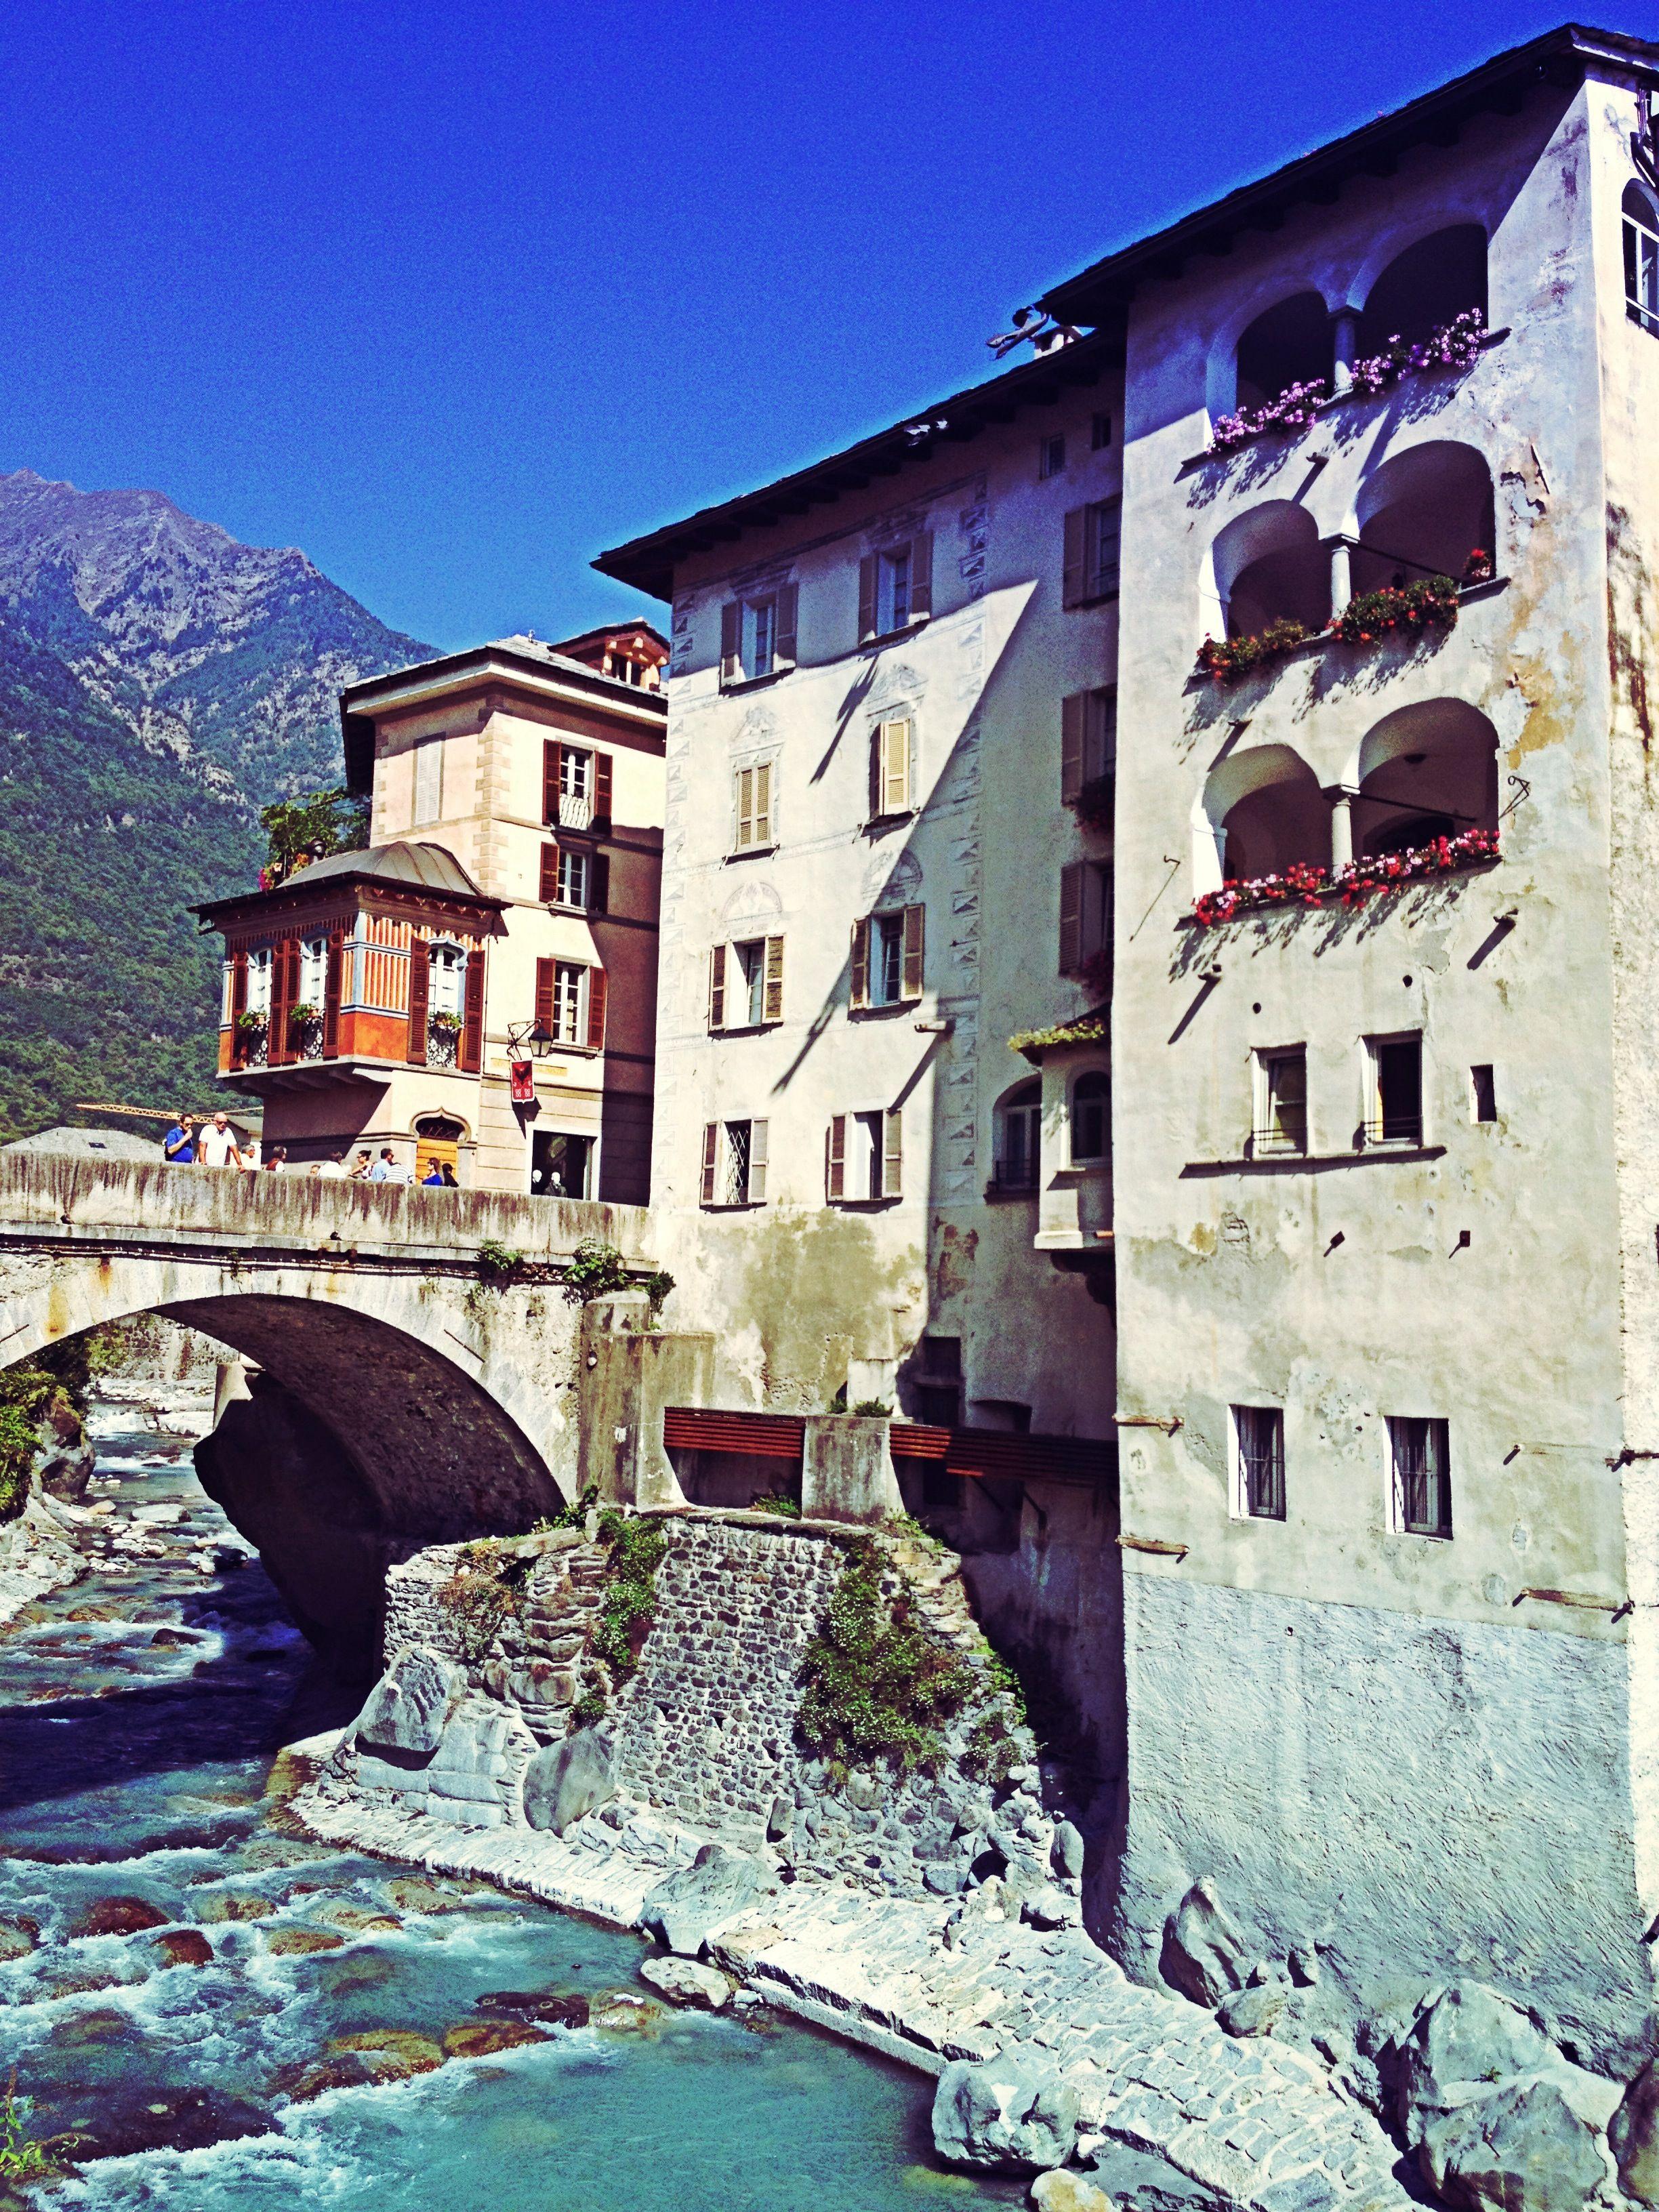 Day 7: Chiavenna | Vakantie, Italië, Rome